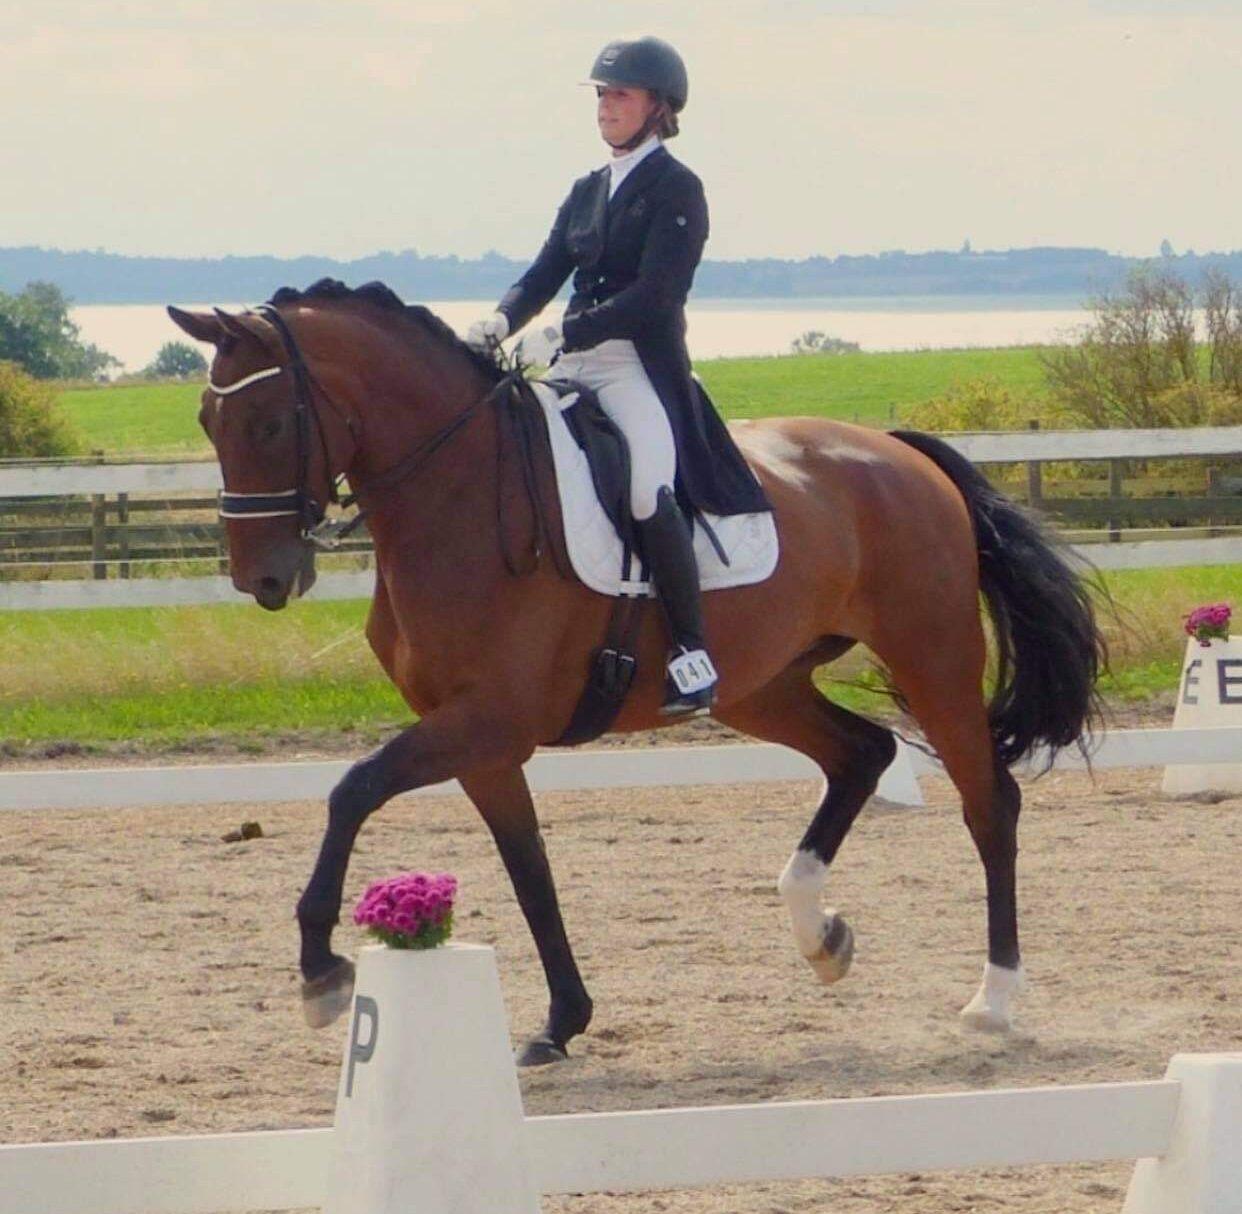 Thomas-Lindegaard-underviser-gek-gentofte-rideklub-800px